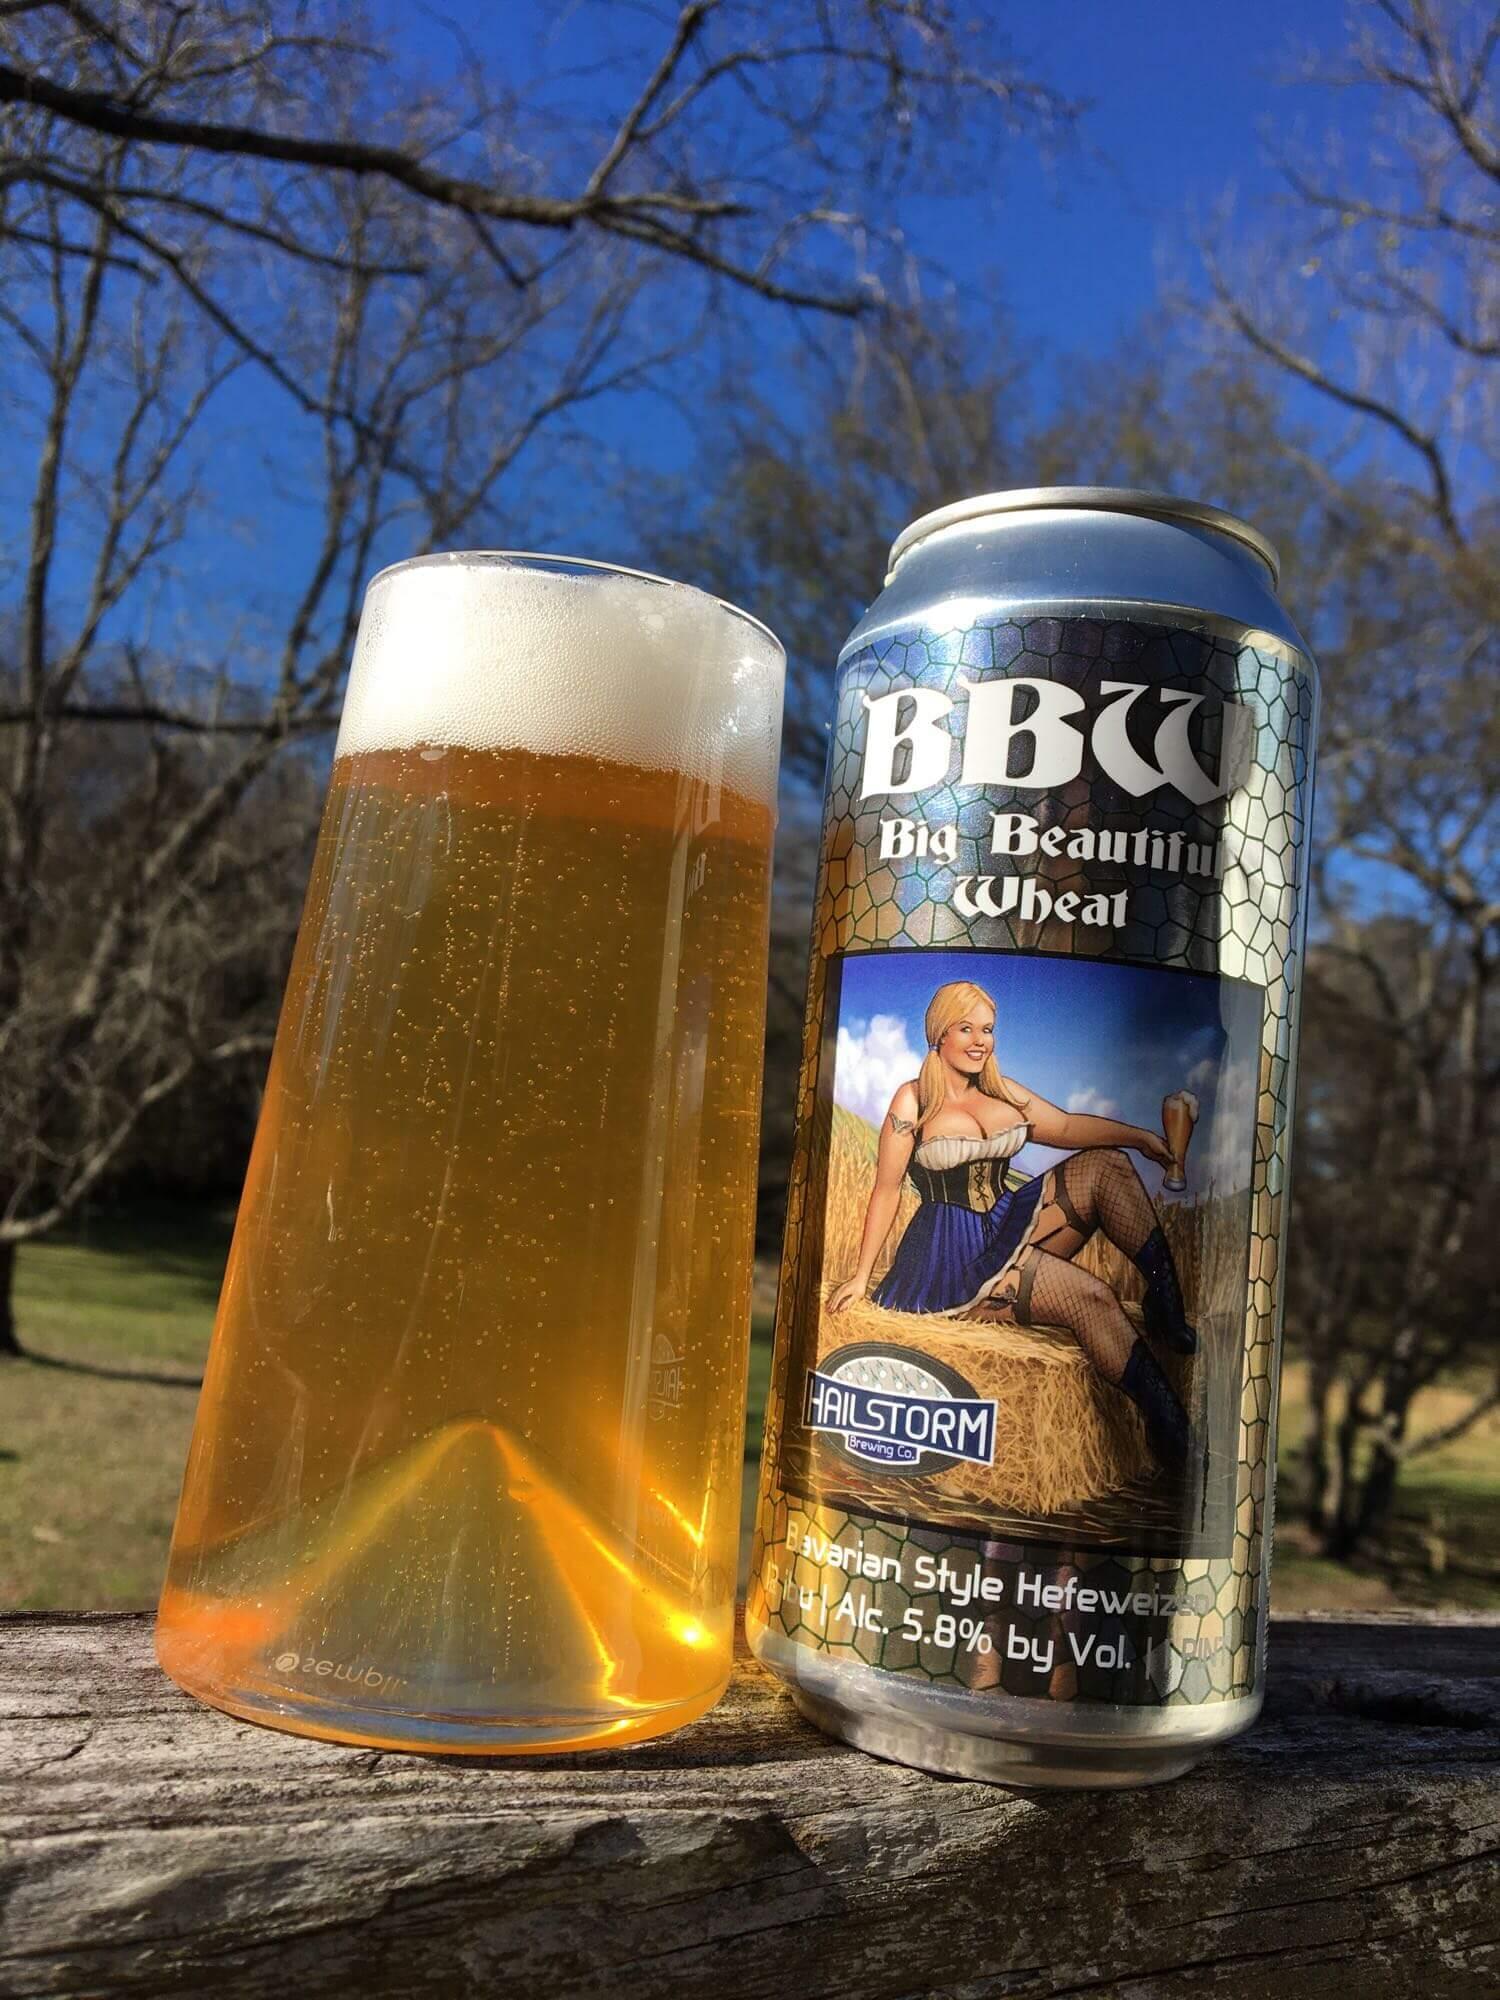 Hailstorm — BBW (Big Beautiful Wheat)